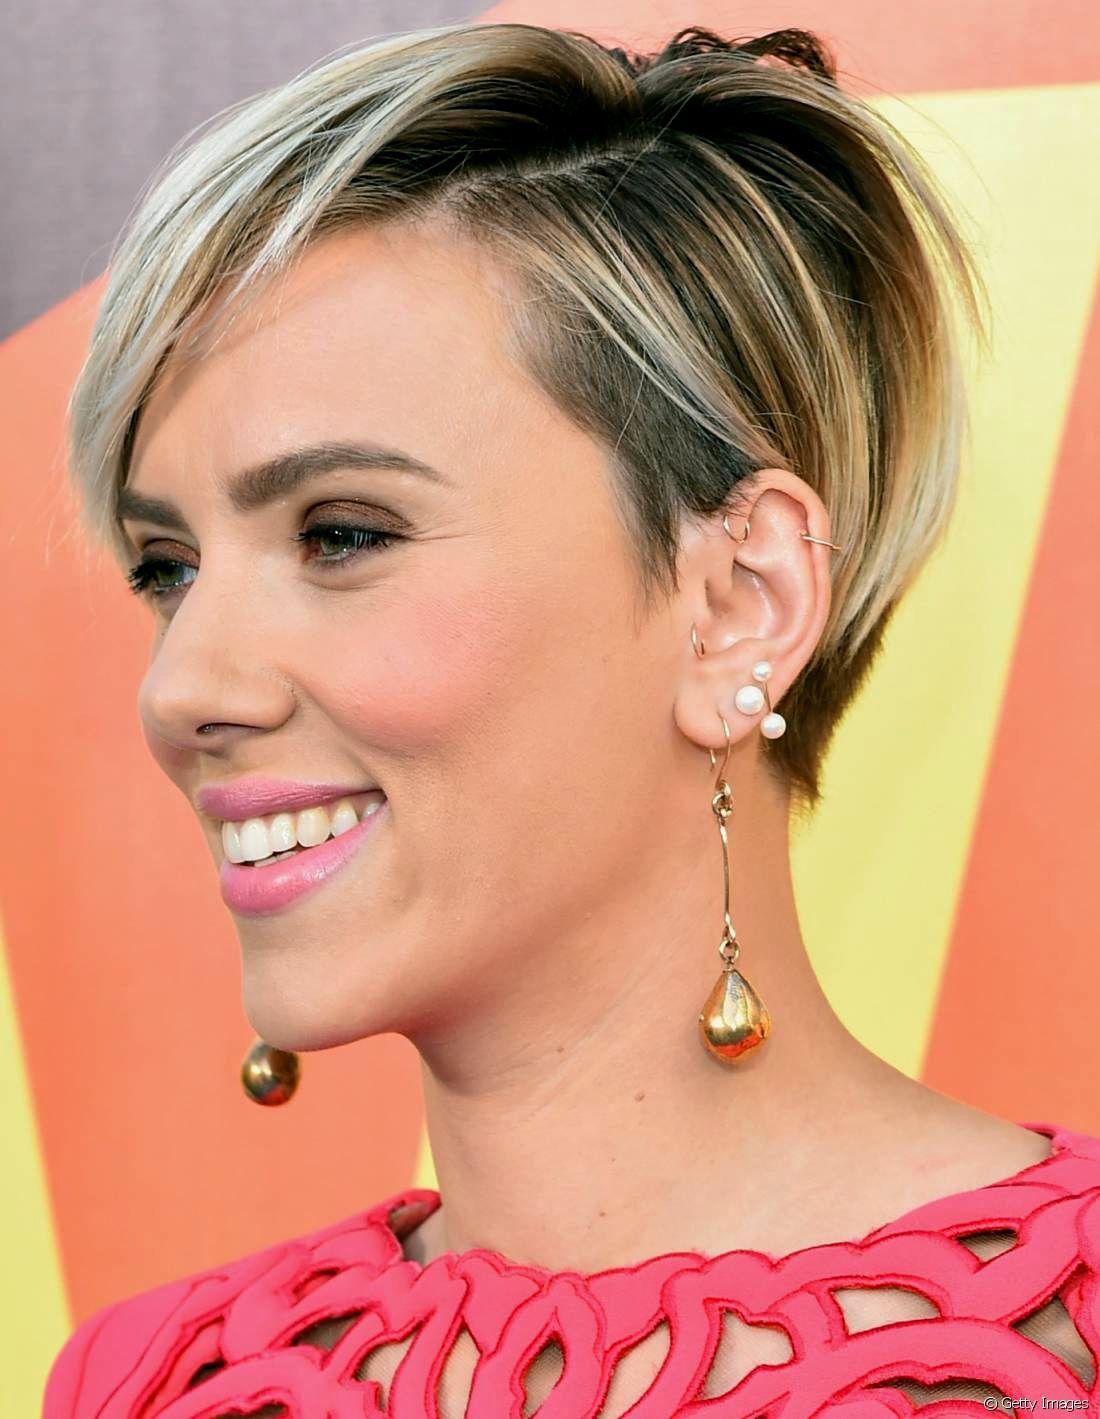 inspirational modelo corte de cabelo curto imagem-Lovely Modelo Corte De Cabelo Curto Retrato